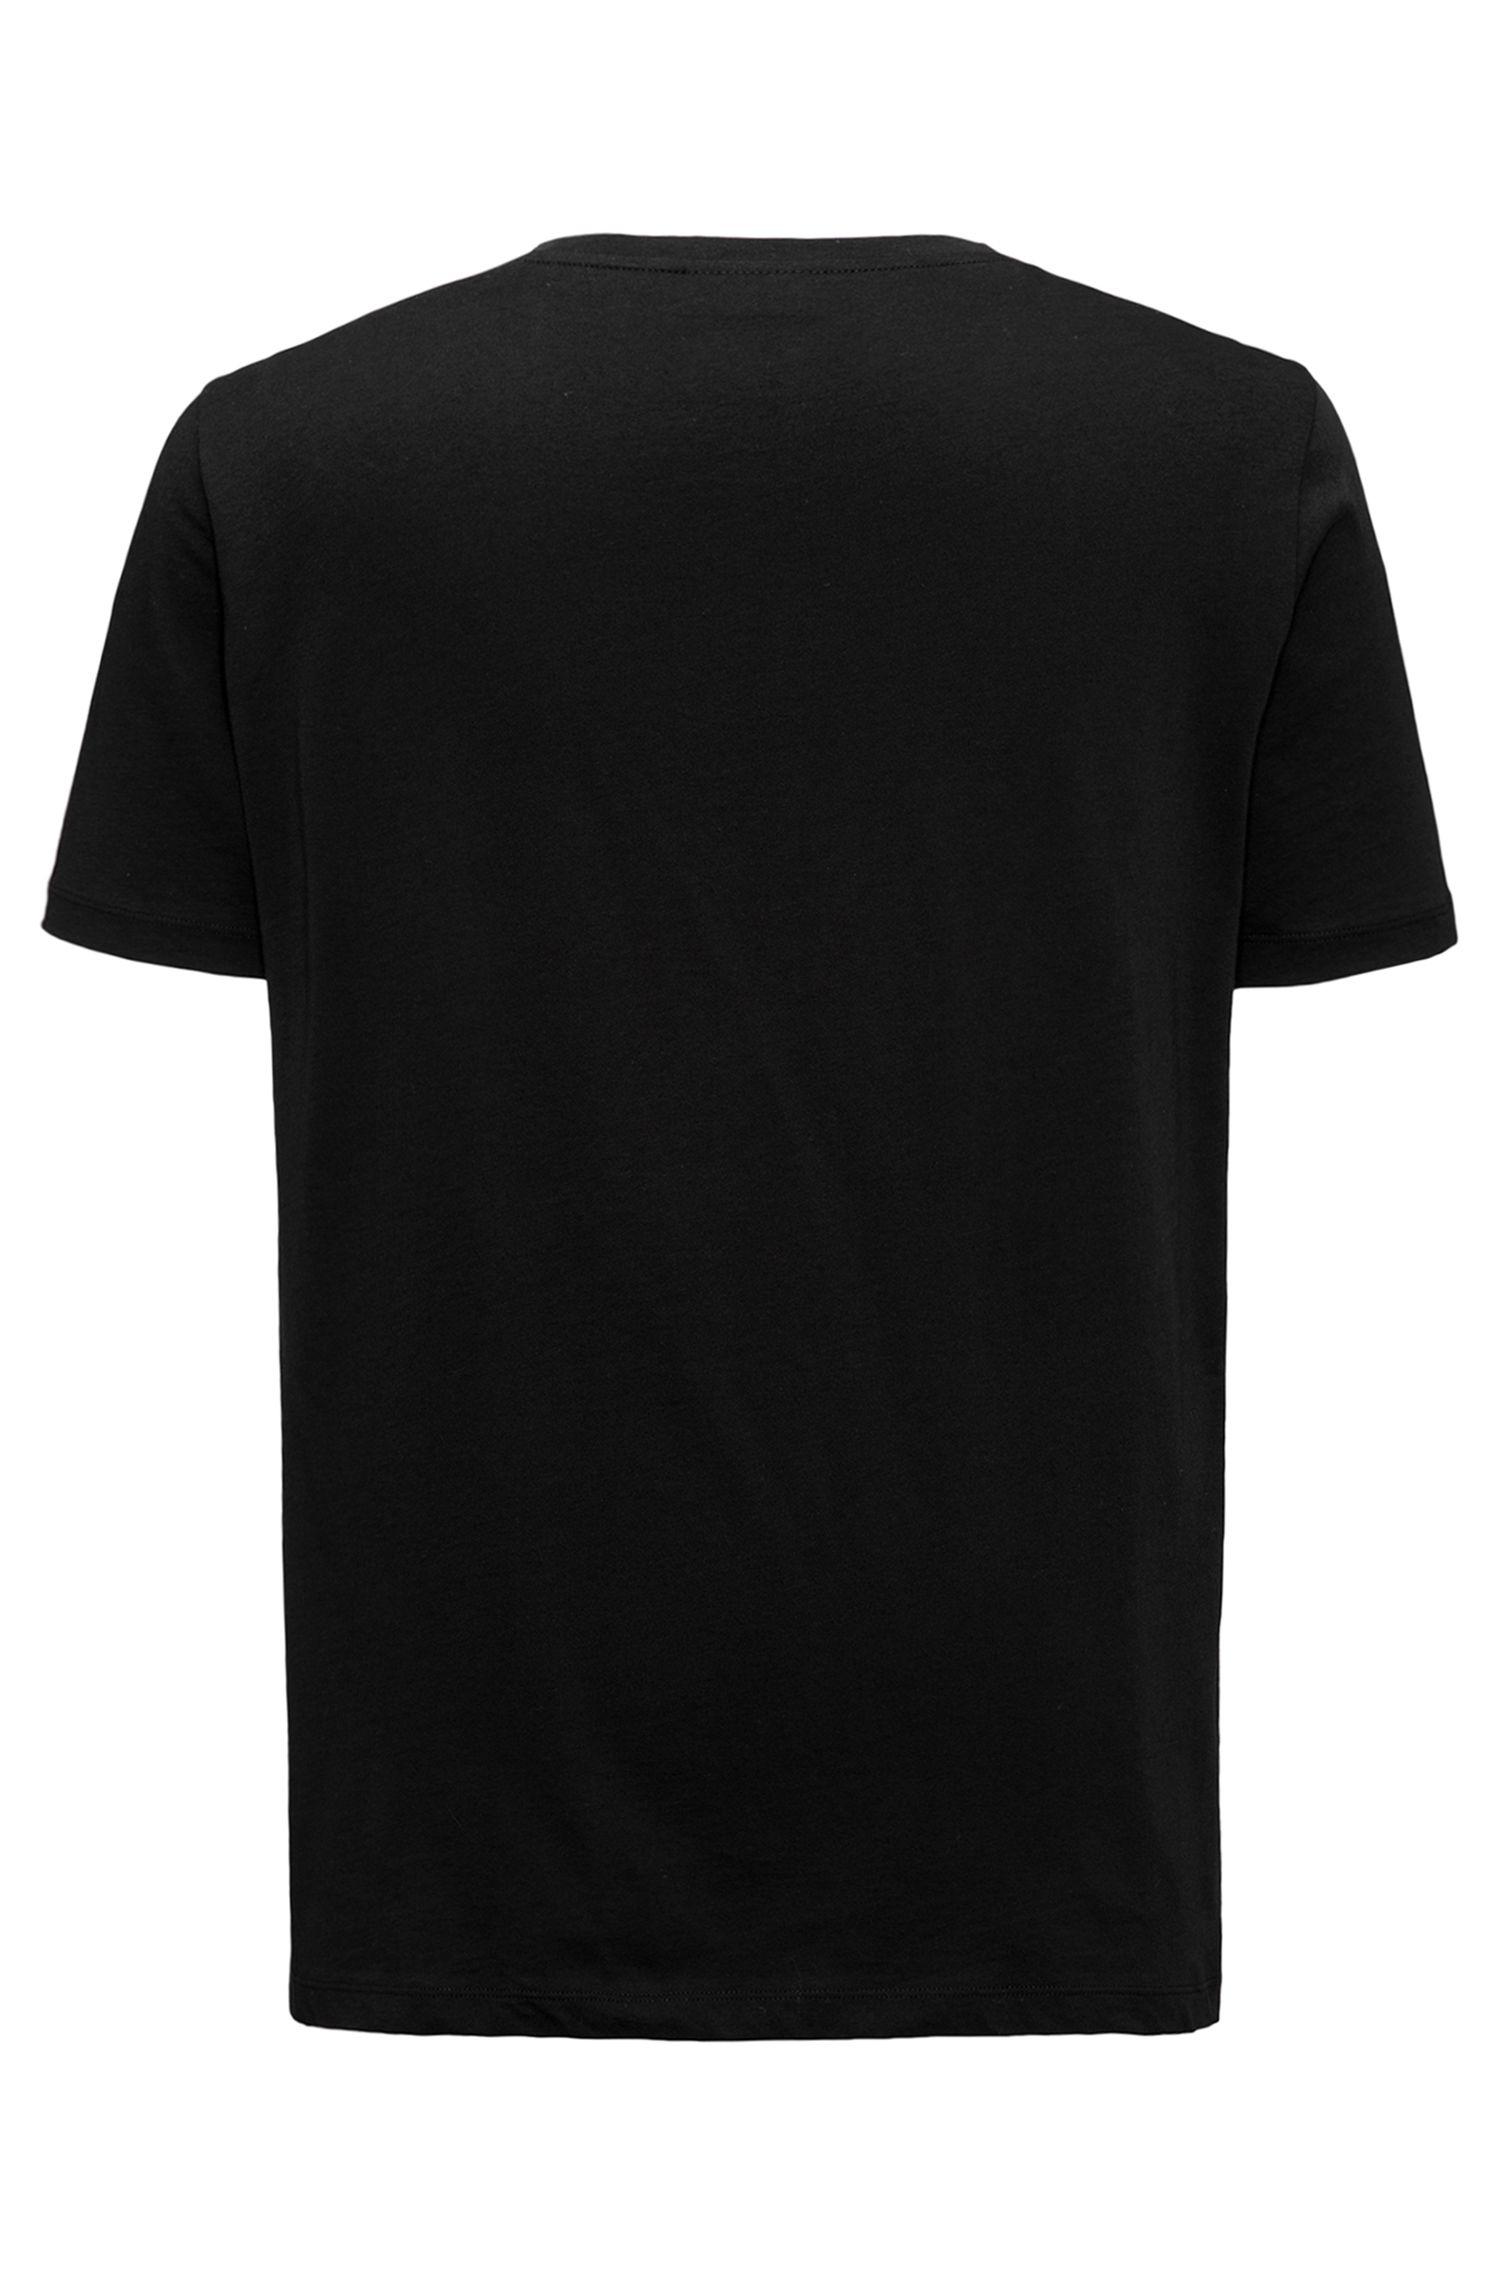 Oversized logo-T-shirt van katoenen jersey